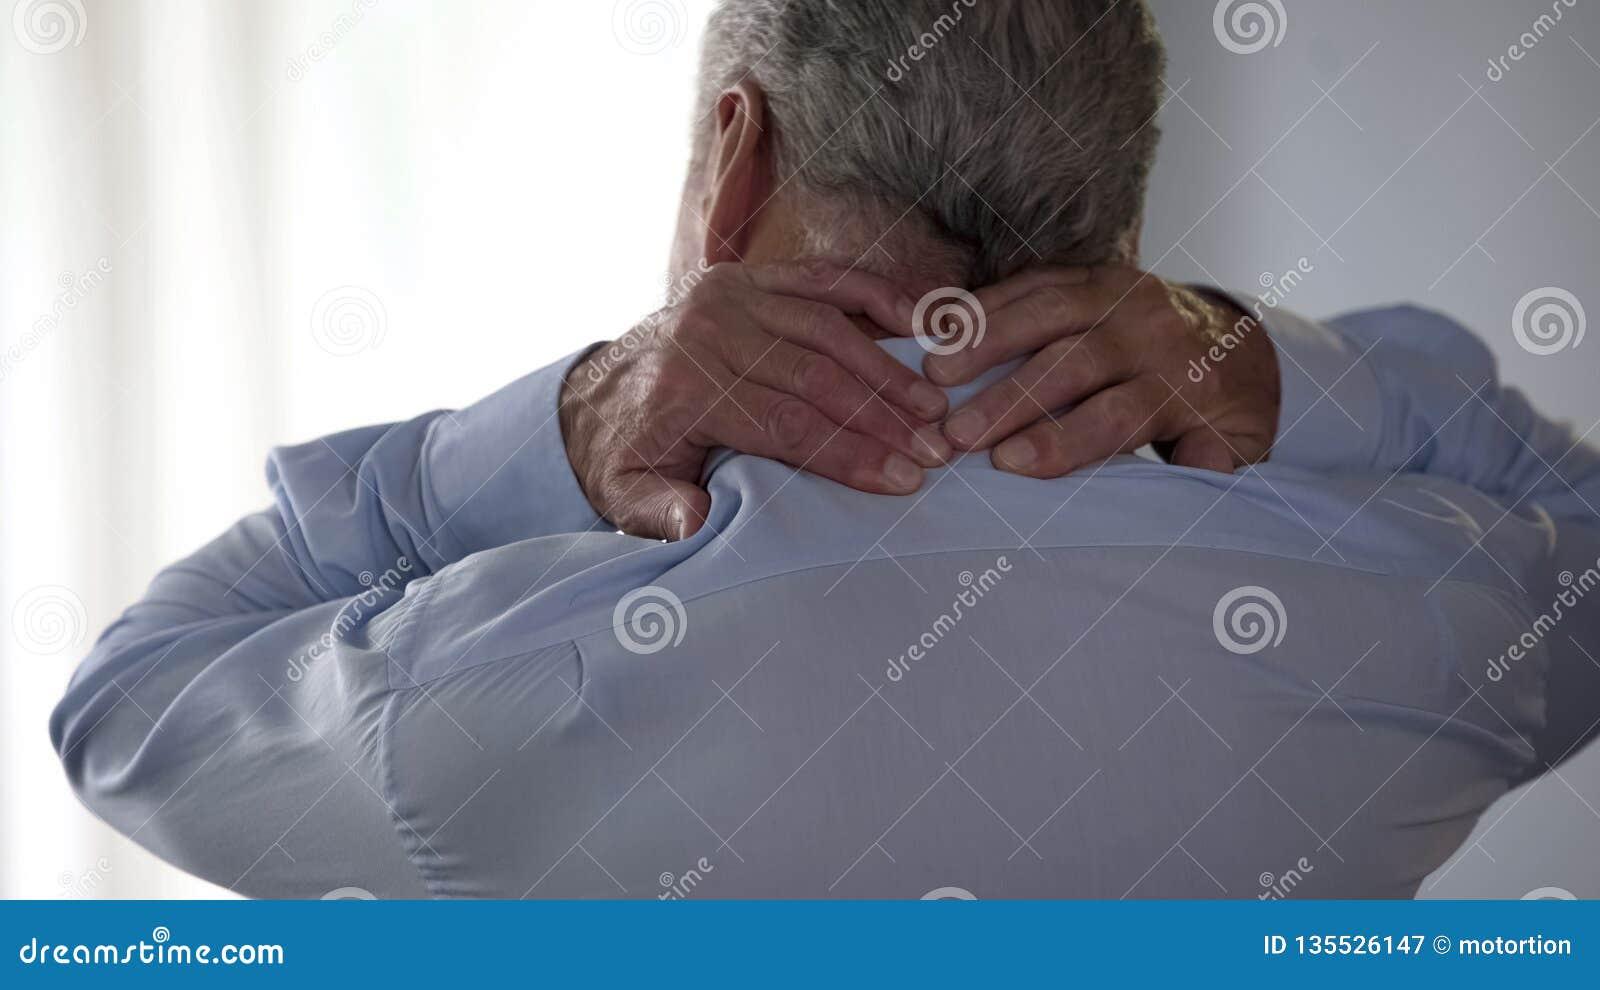 Retiree man rubbing back of his neck, standing backwards, office desk worker